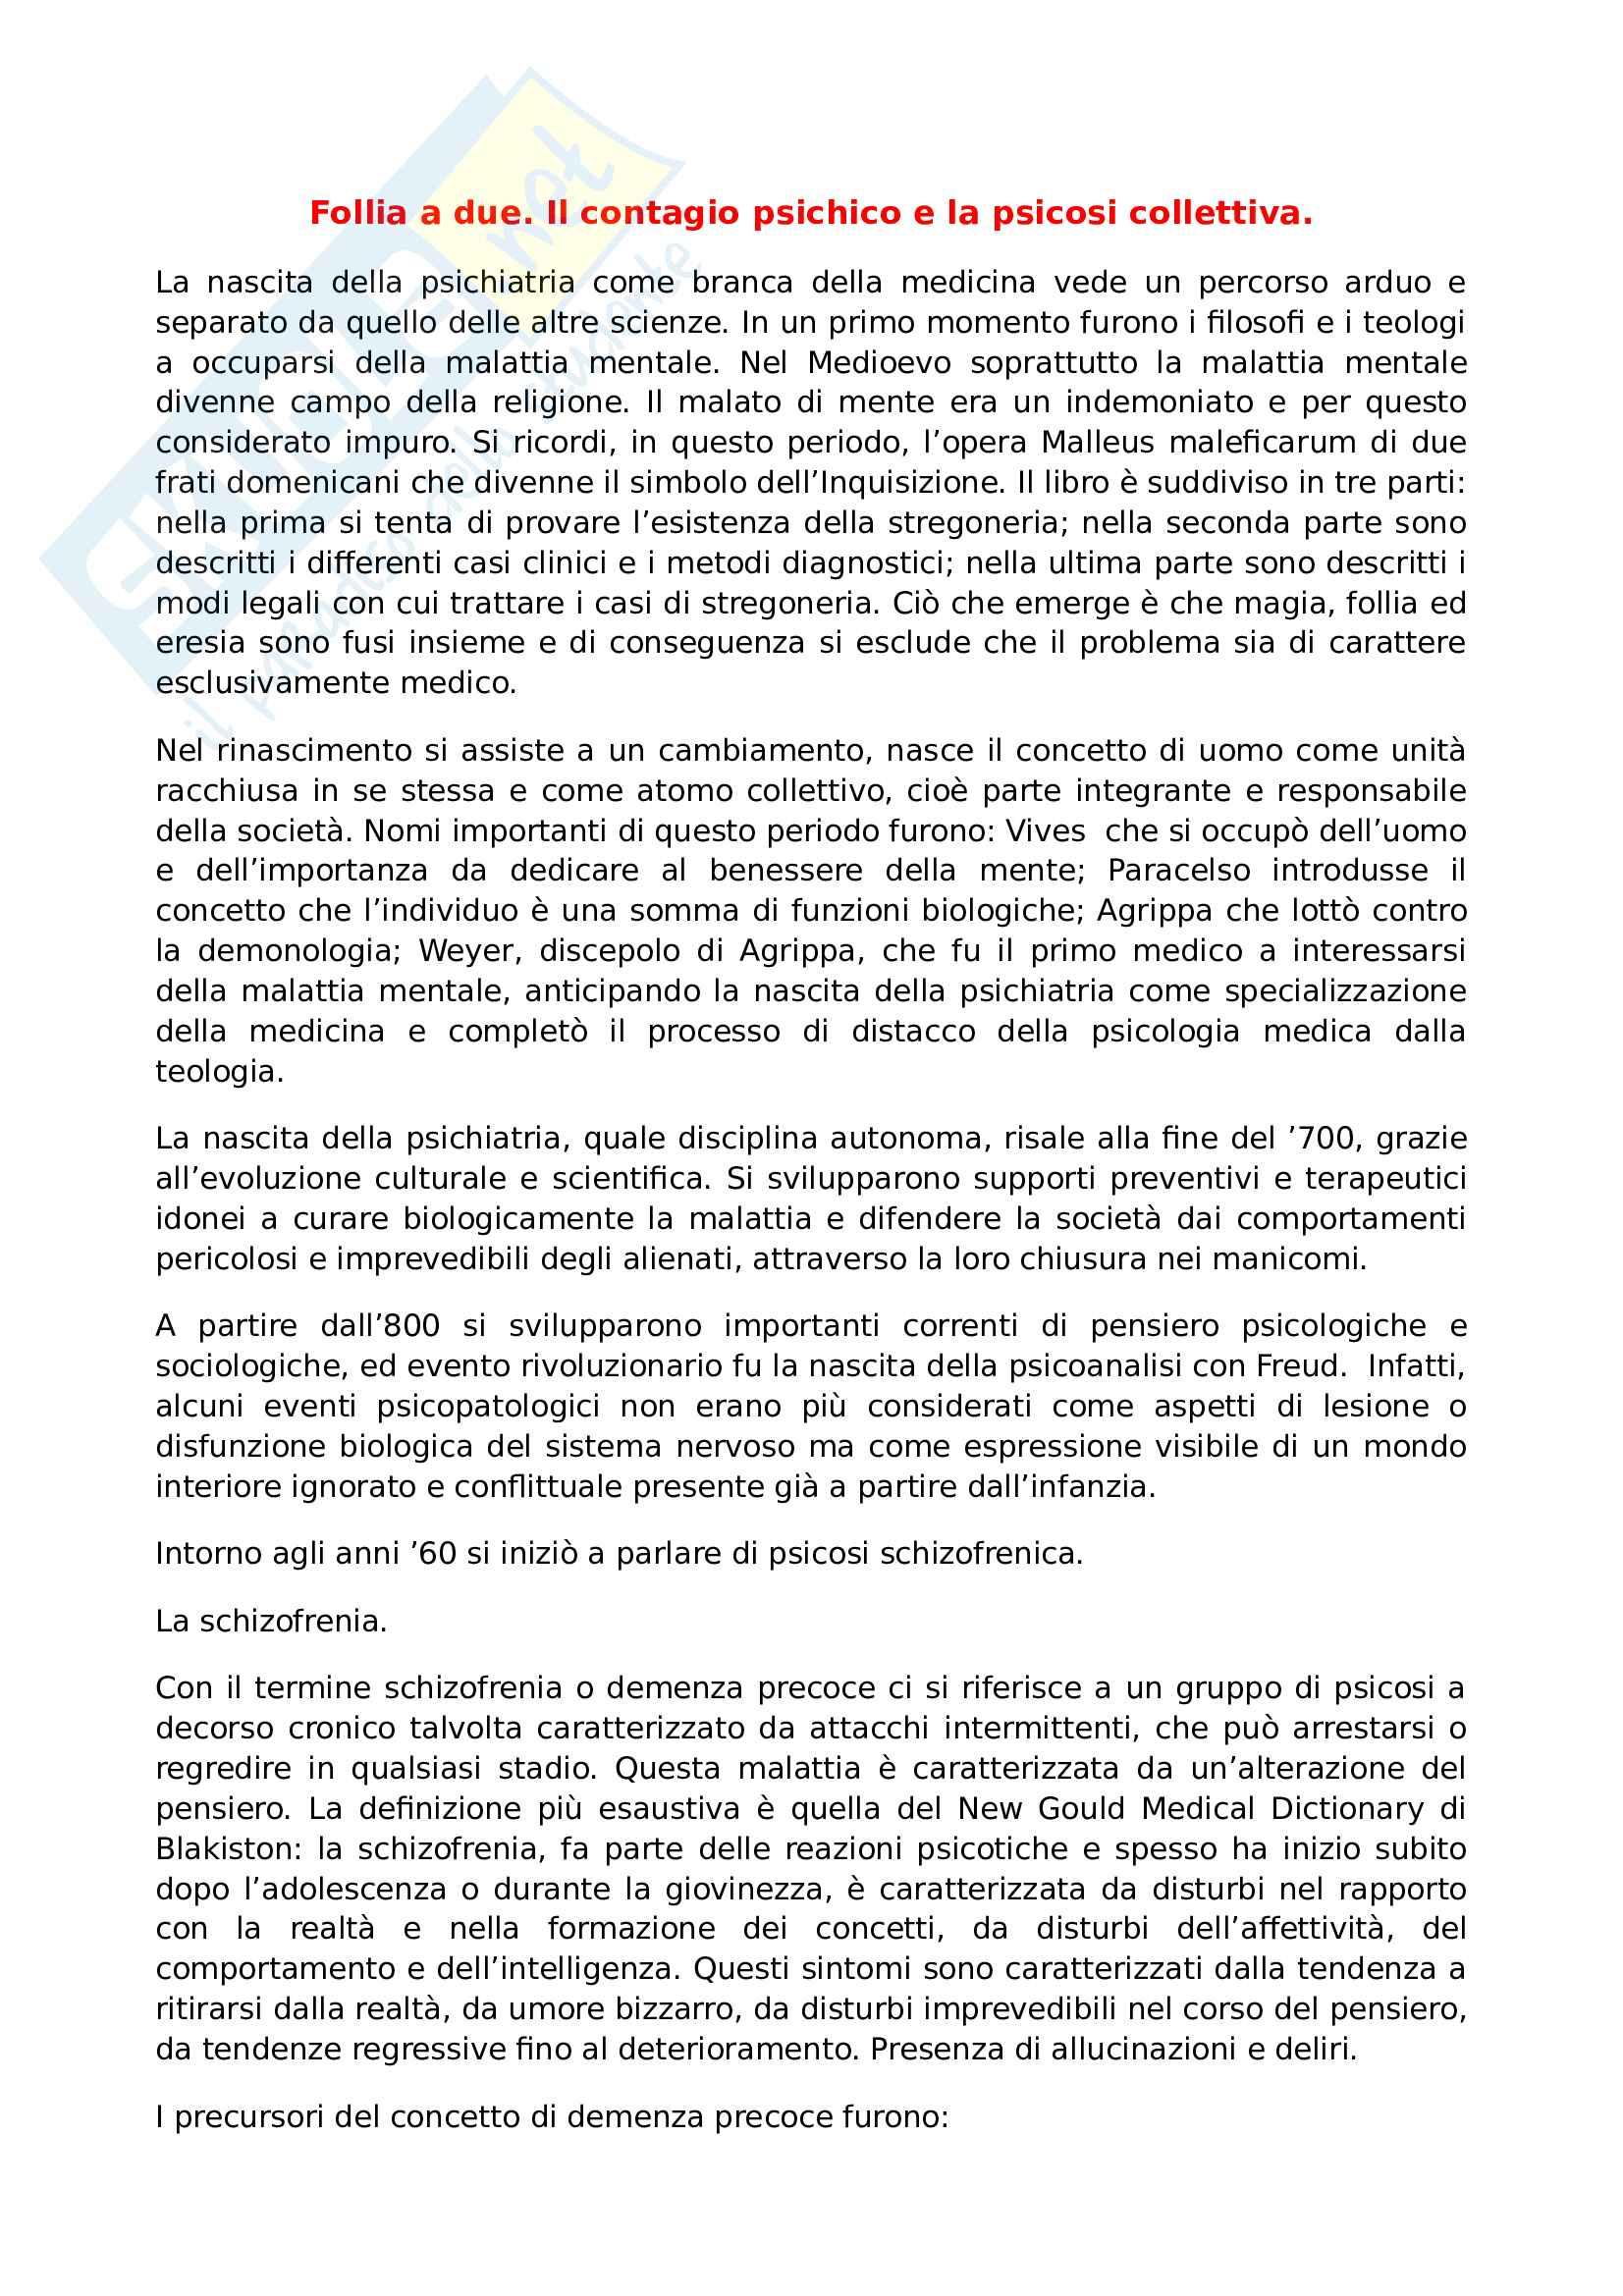 Riassunto esame psicologia dinamica, prof. Saraceno, libro consigliato Follia a due, Saraceno e Santanocito